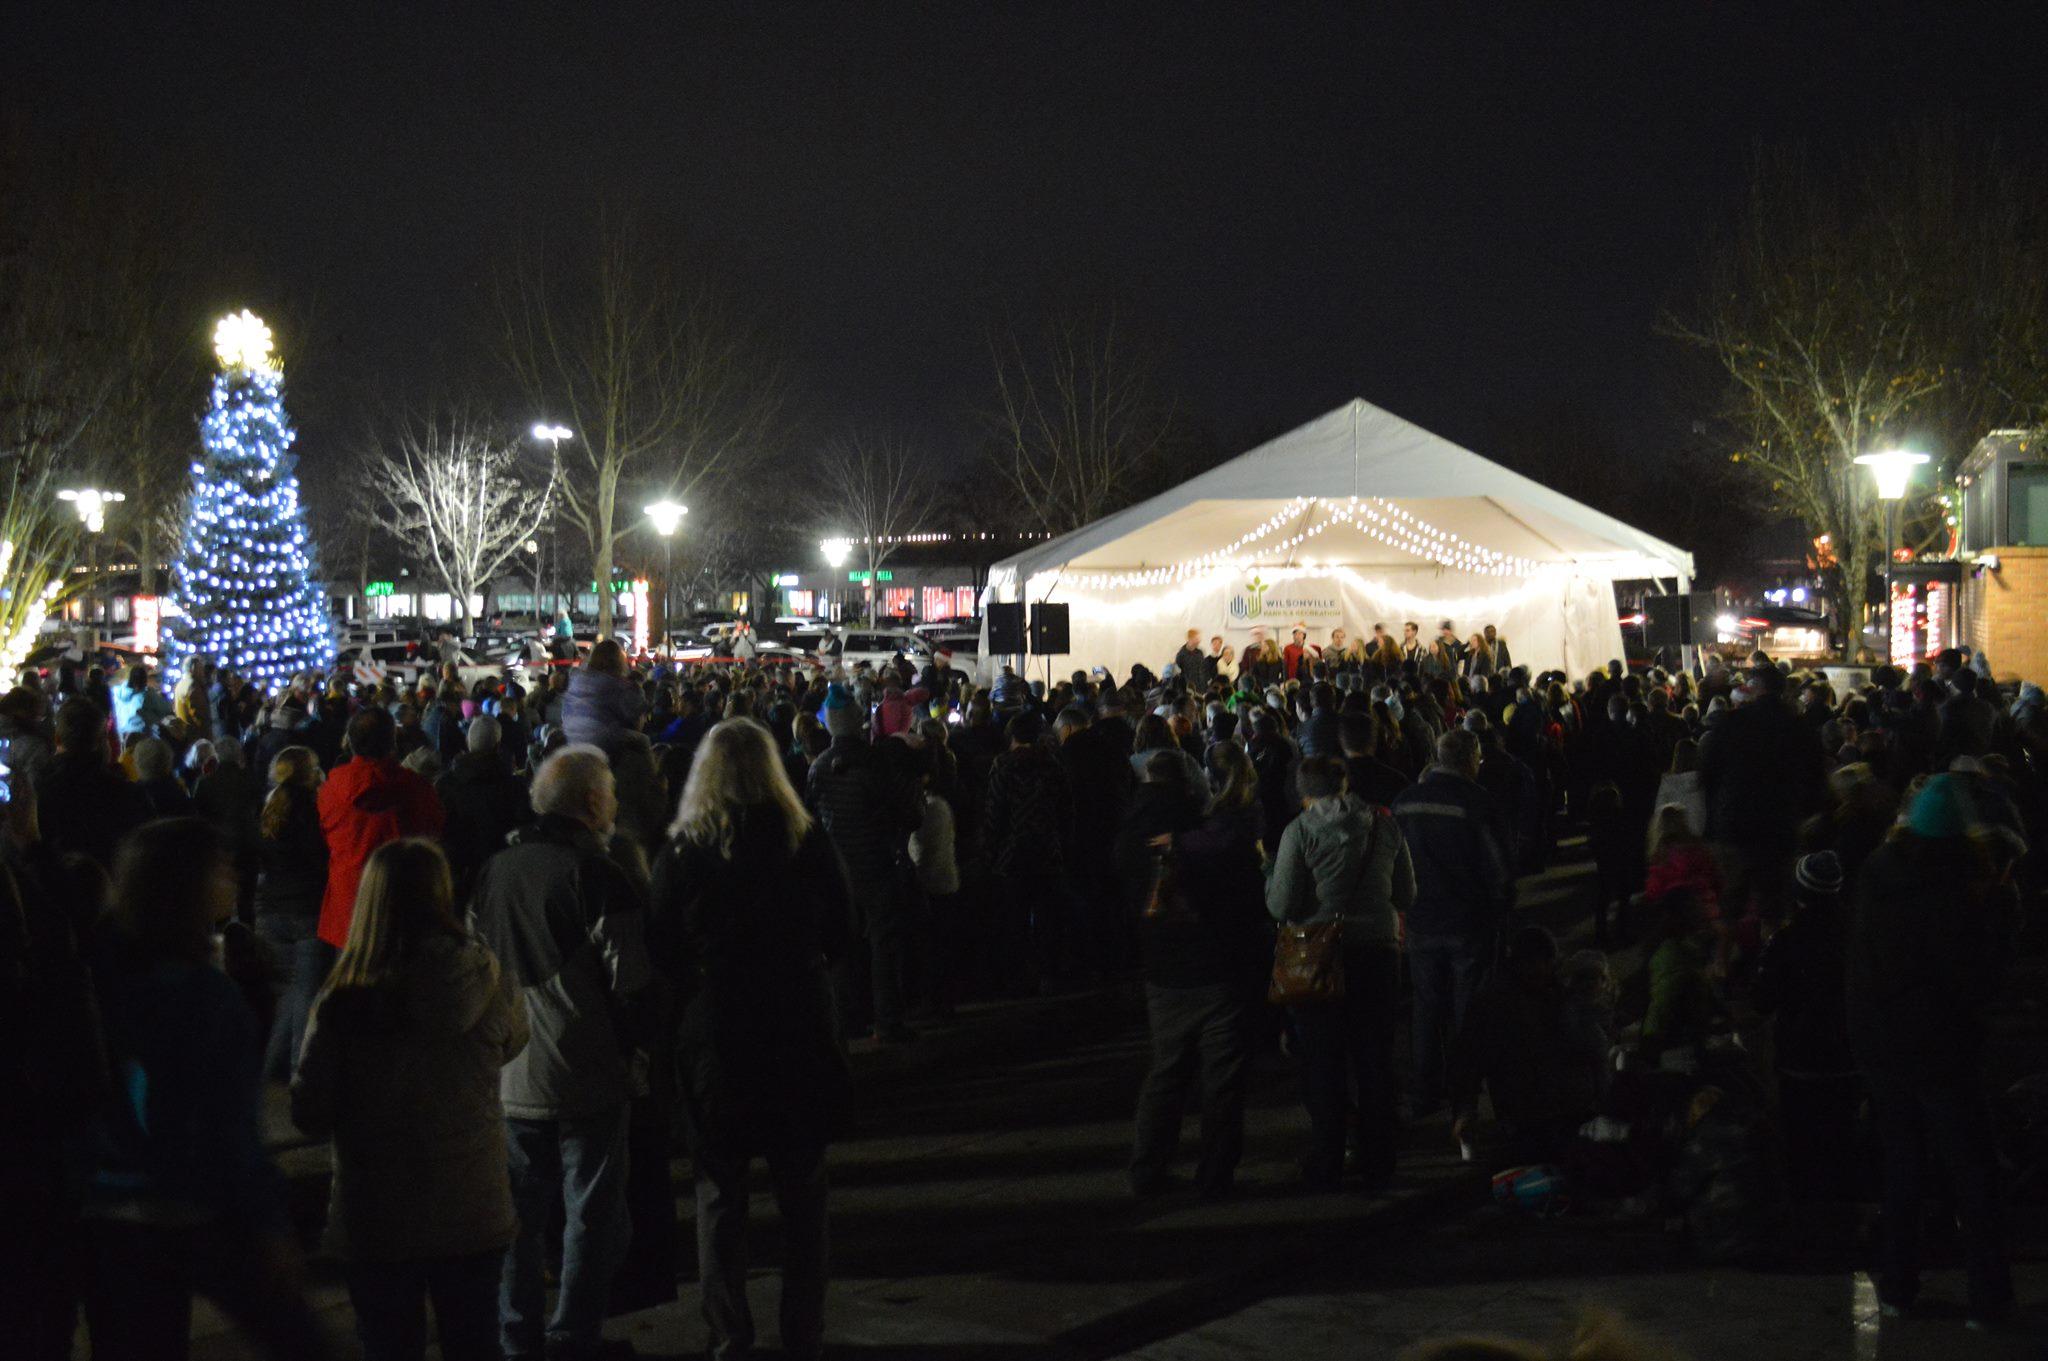 Wilsonville Community Tree Lighting. Nov 28 at 5:30pm